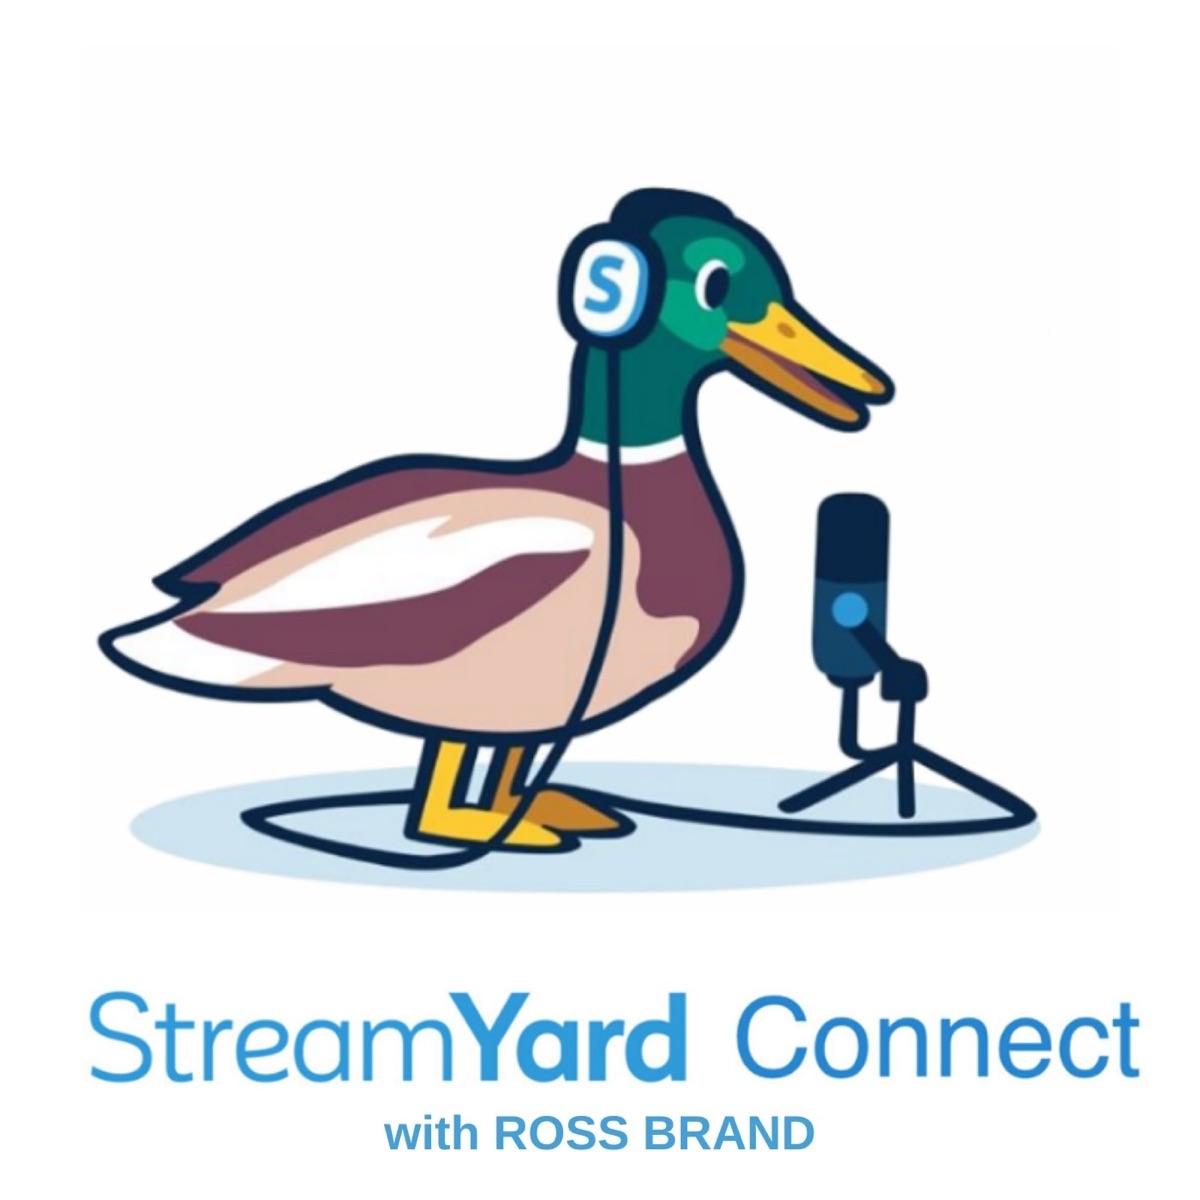 StreamYard Connect